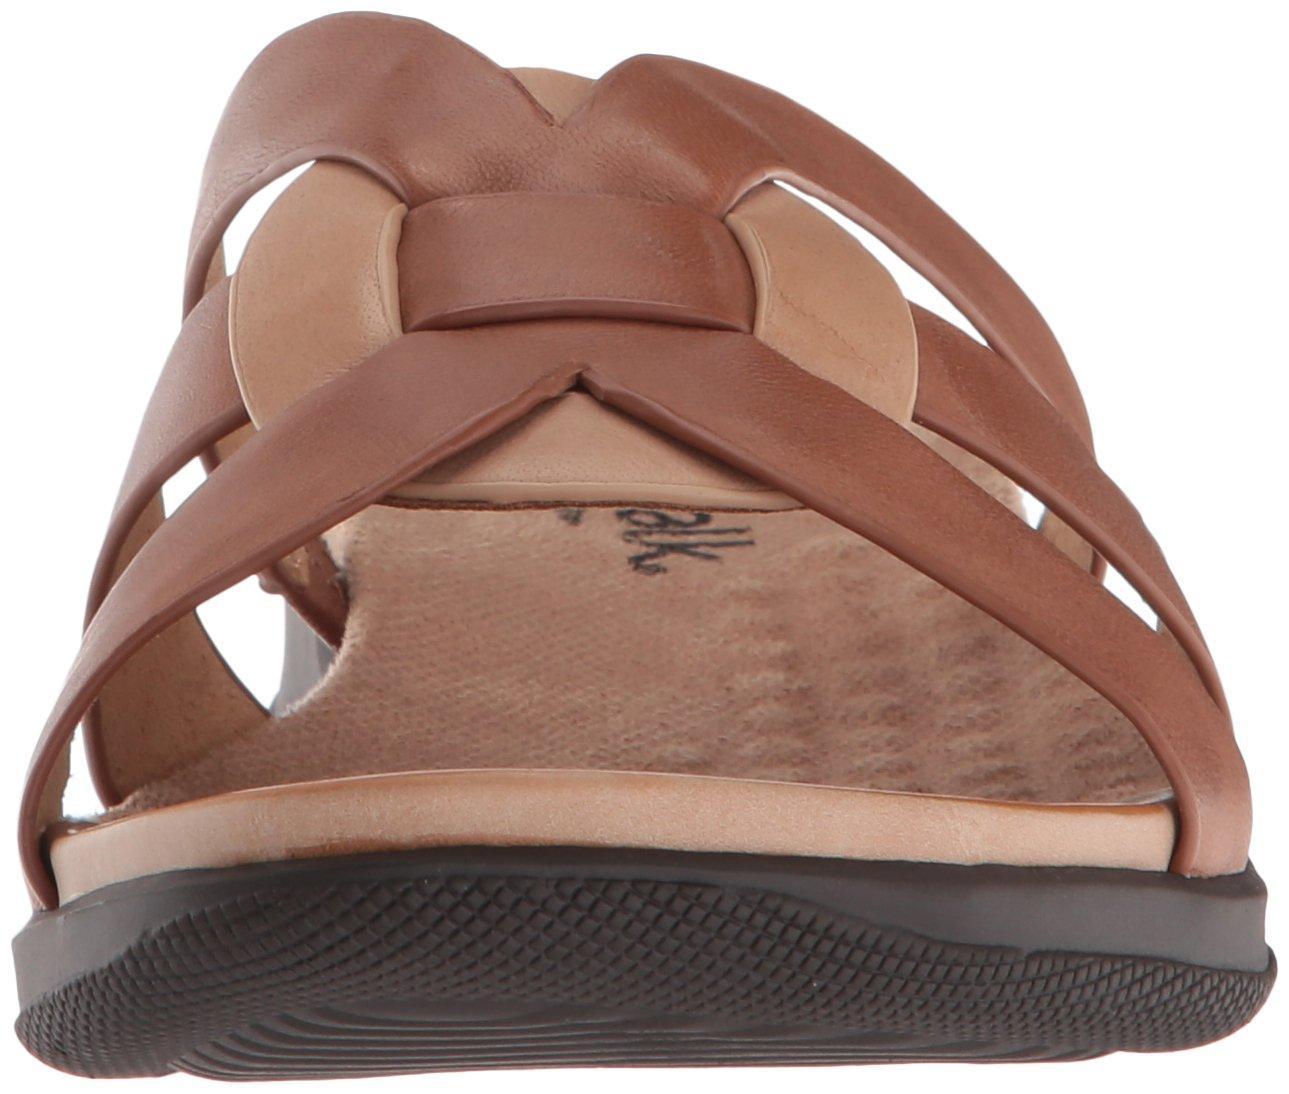 Beacon Shoes Drizzle(Women's) -Black Plaid Polyurethane For Sale Finishline Marketable For Sale Finishline Cheap Online Free Shipping Cheap Online 1opxrFpC